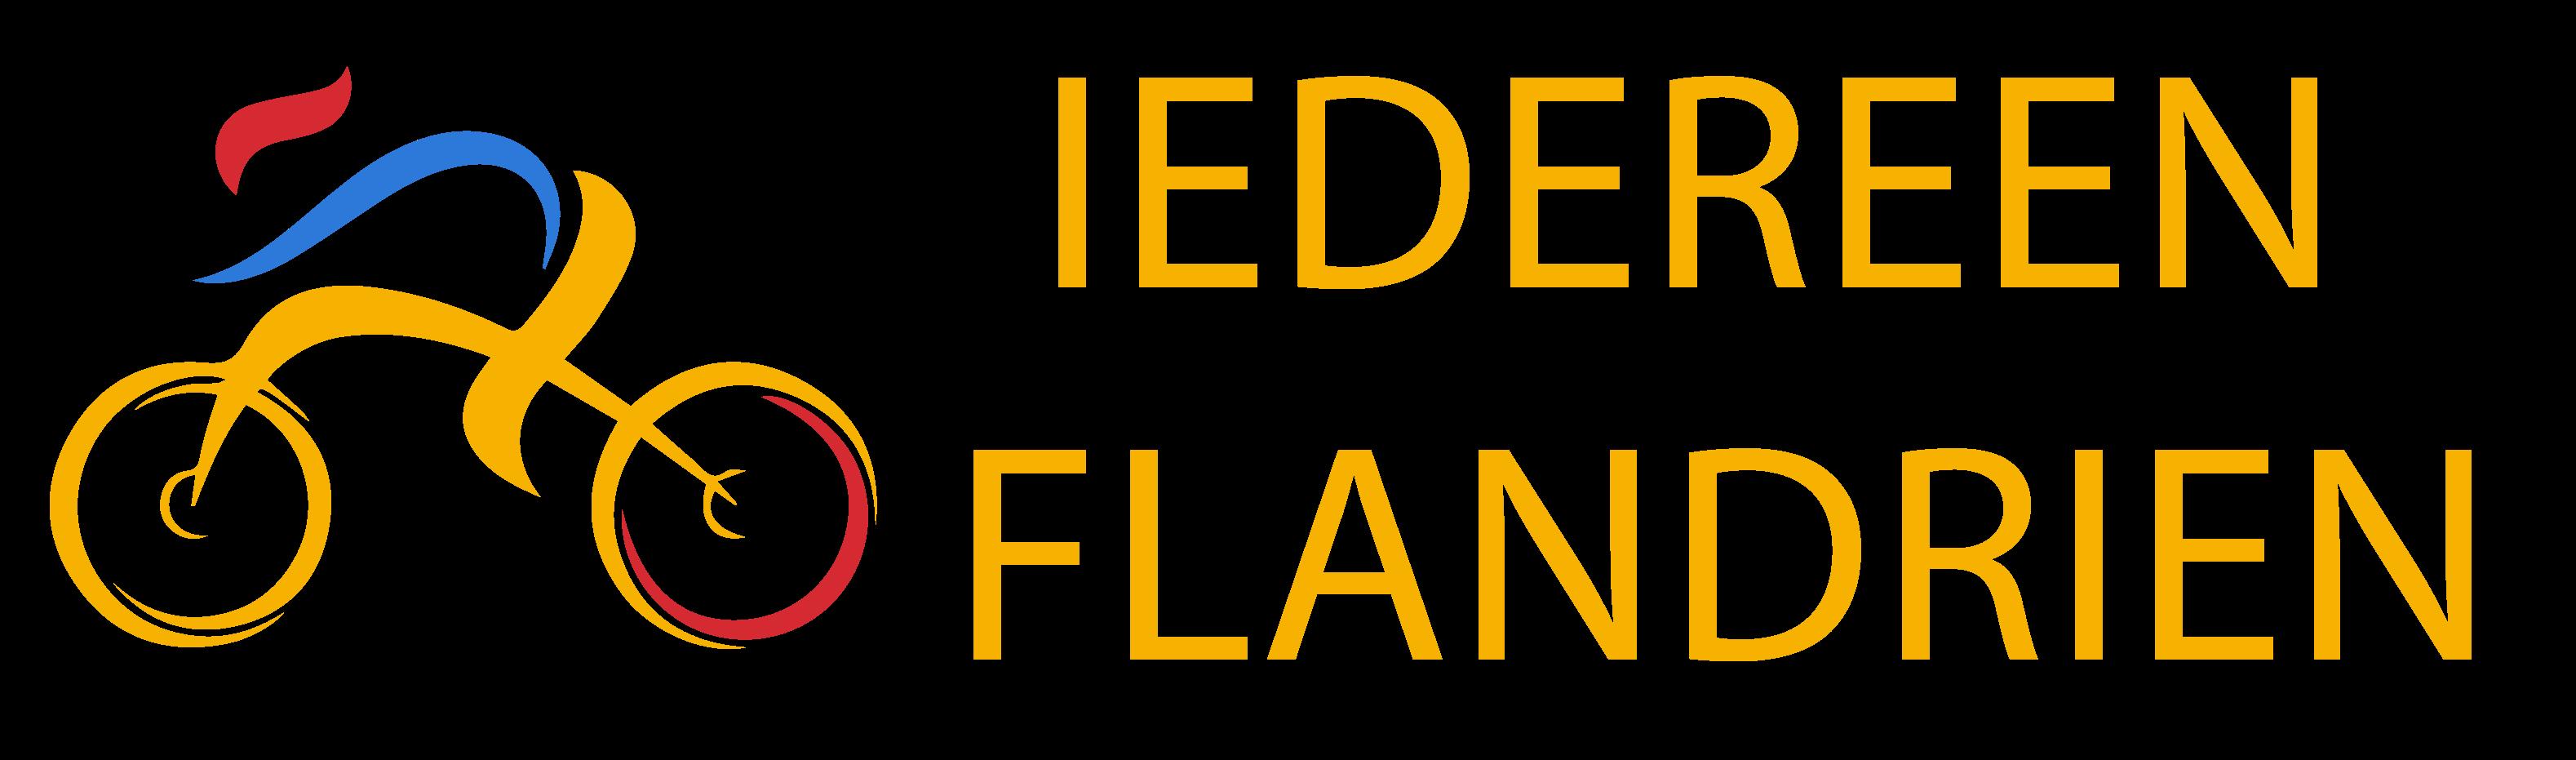 Ledereen Flandrien